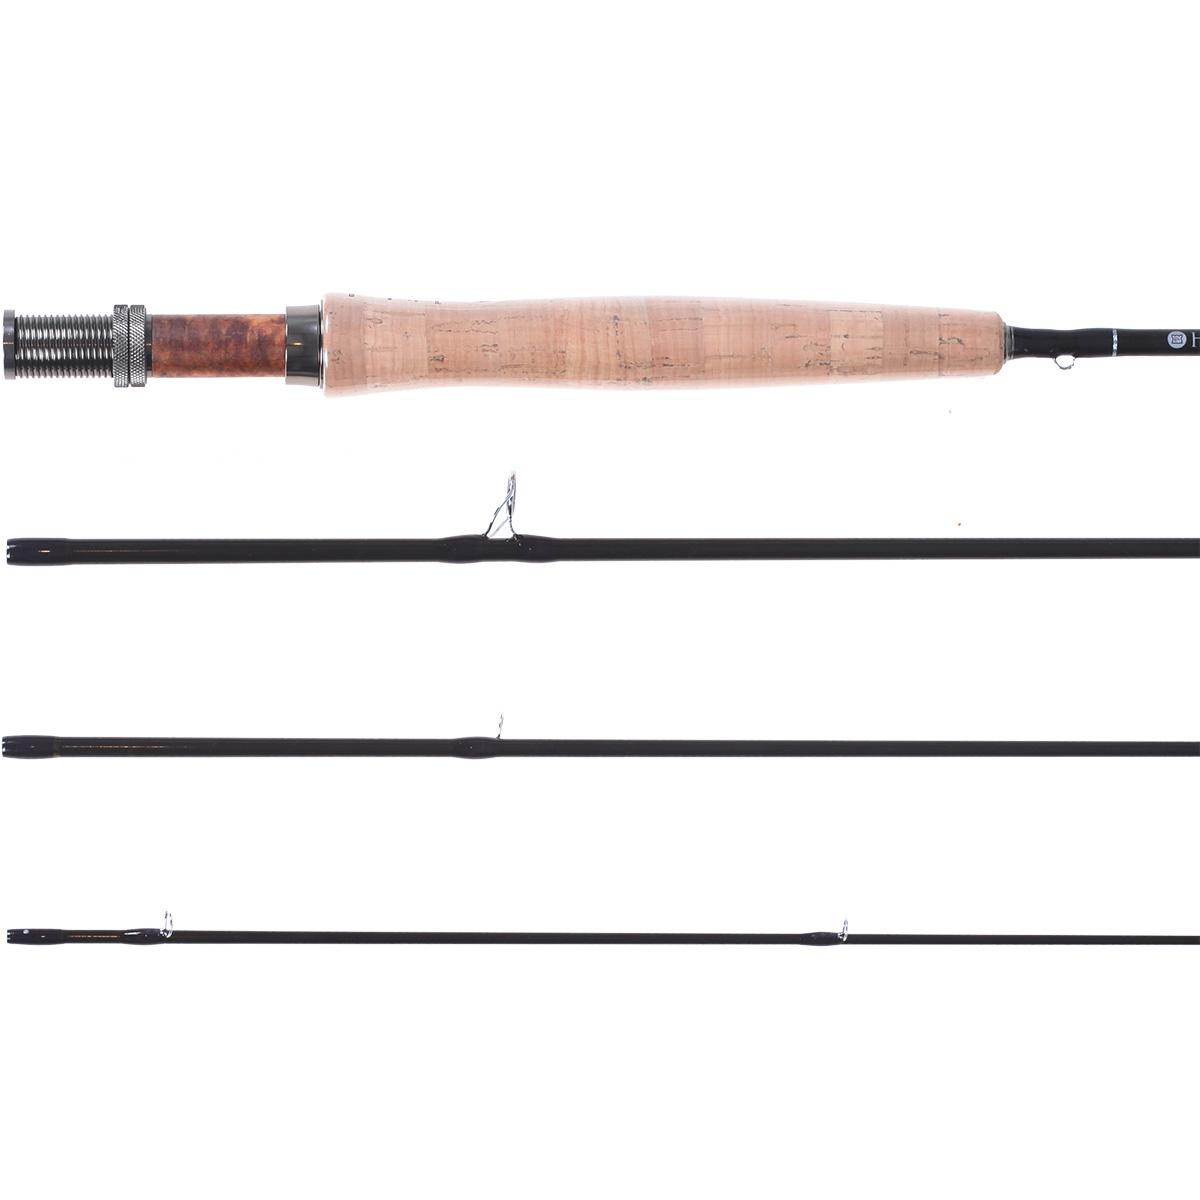 Hardy shadow fly fishing rods ebay for Ebay fly fishing